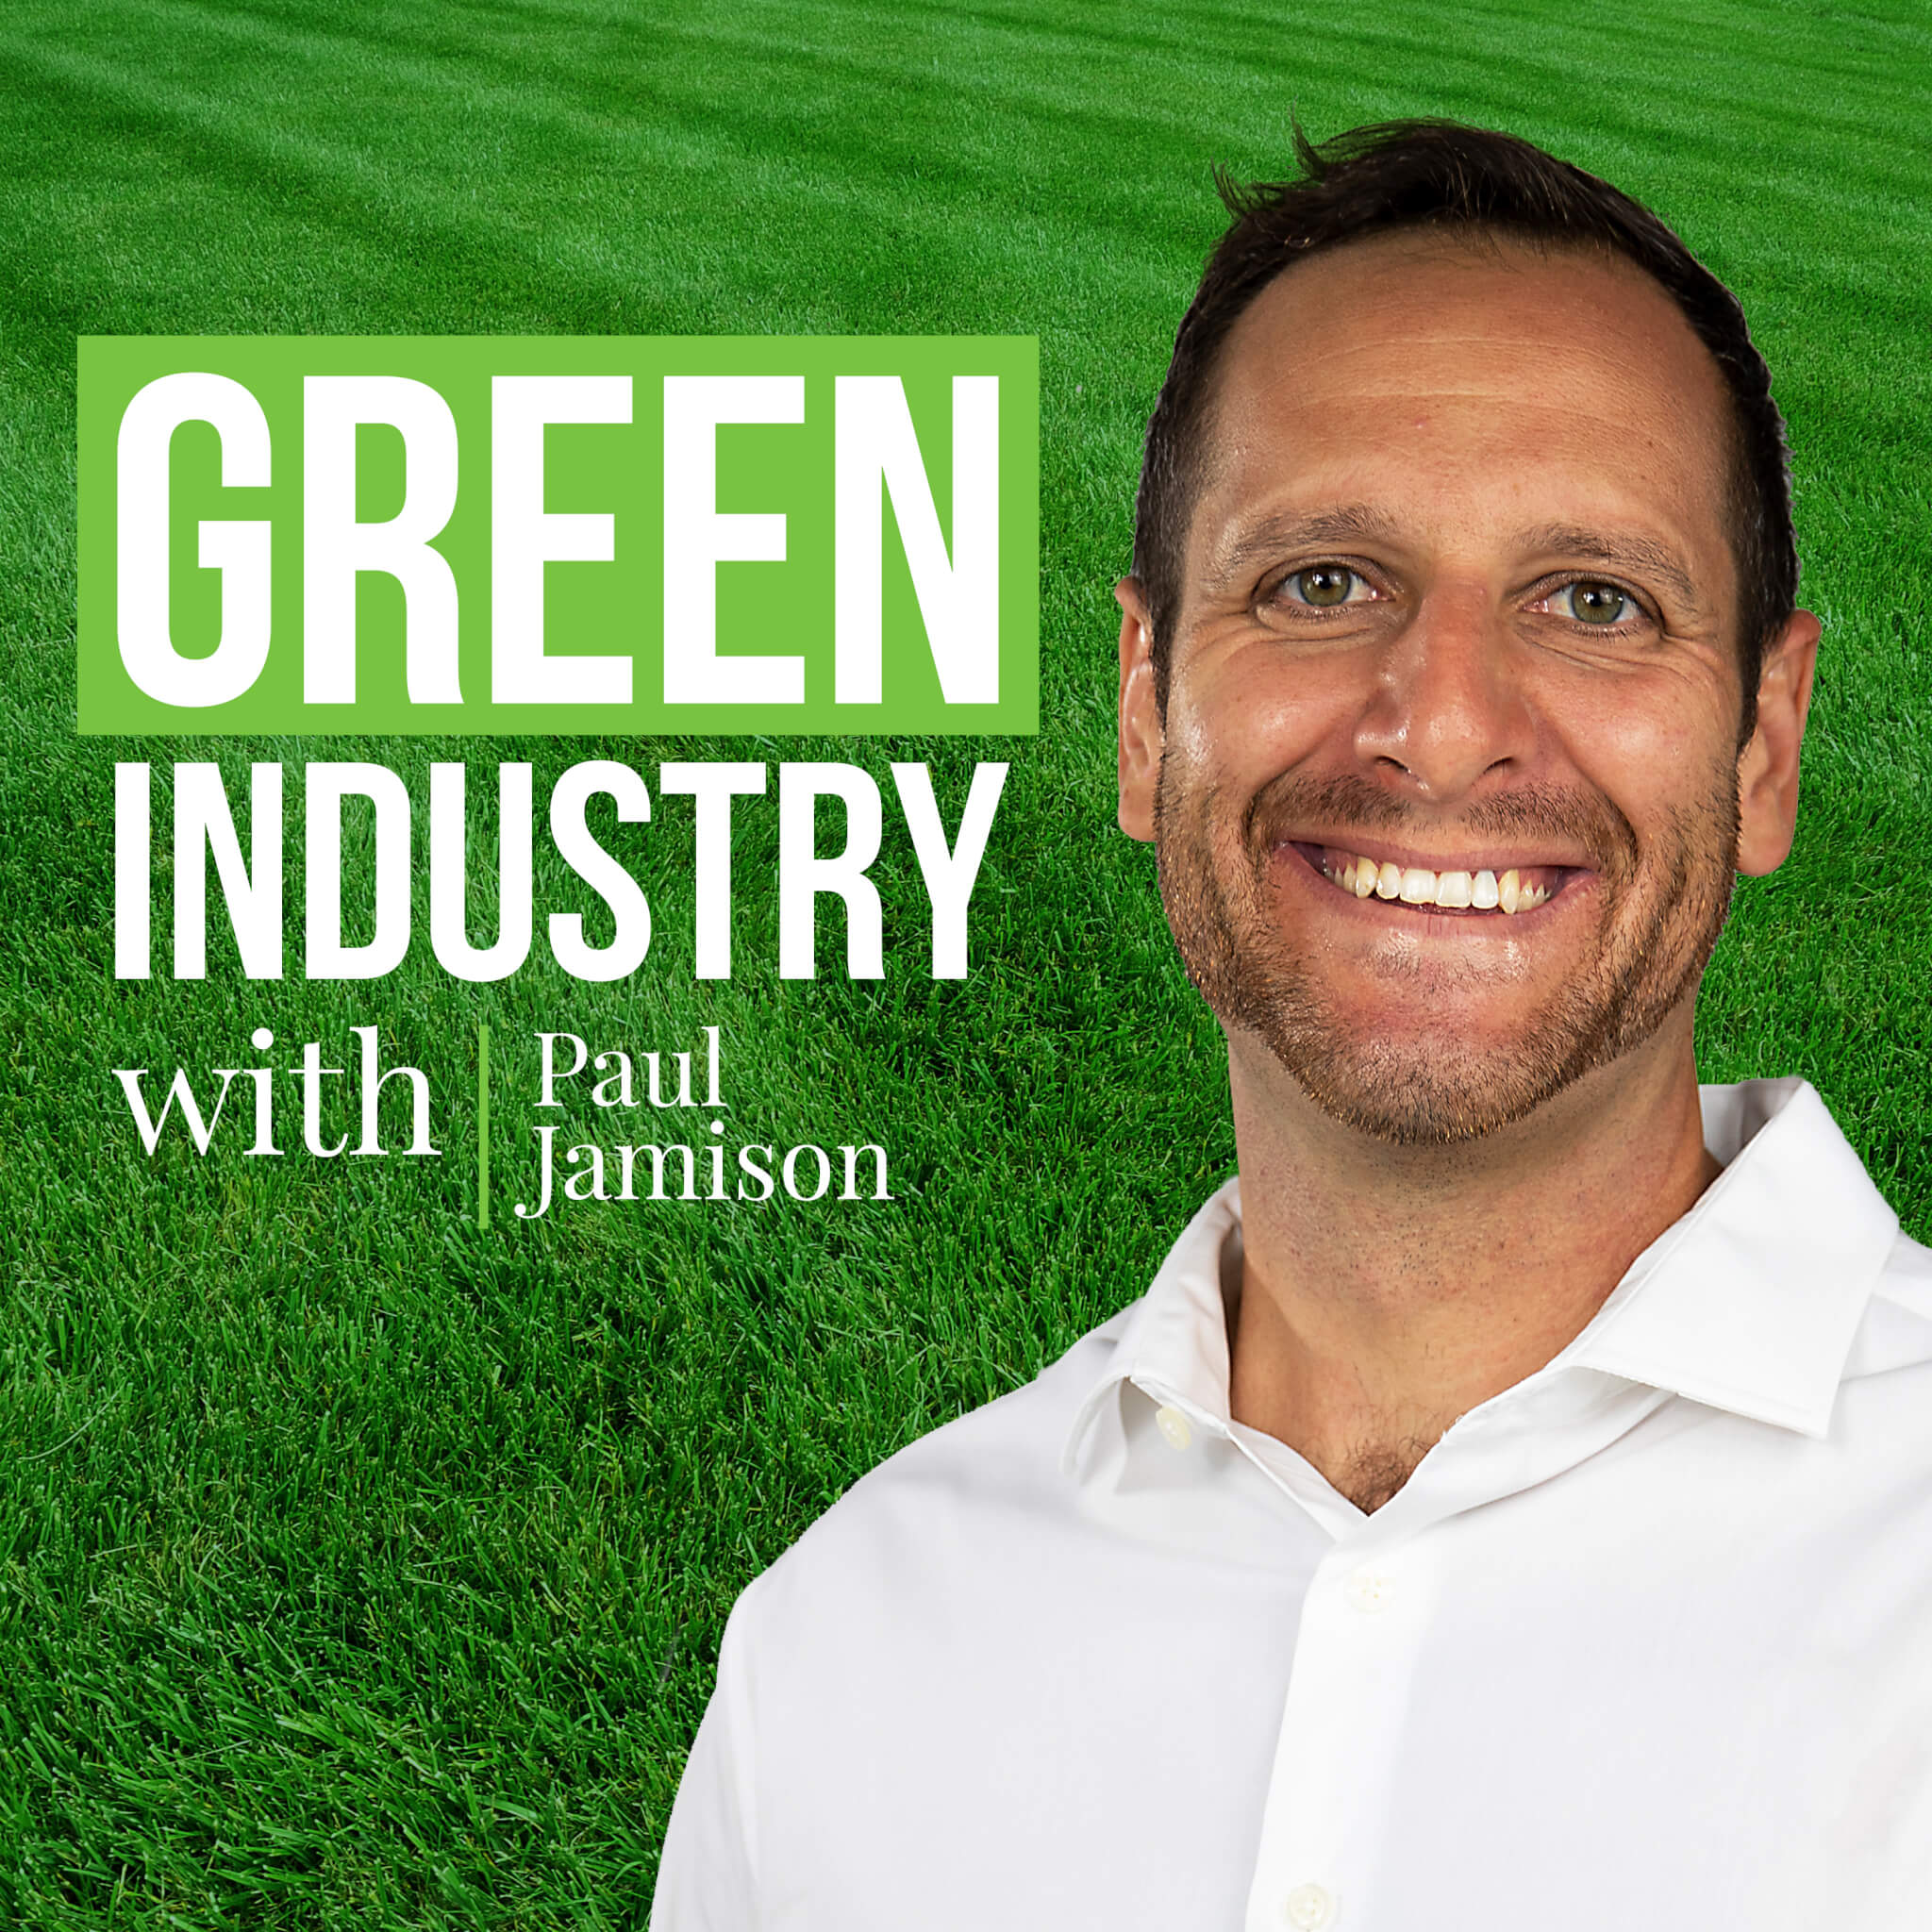 Paul Jamison